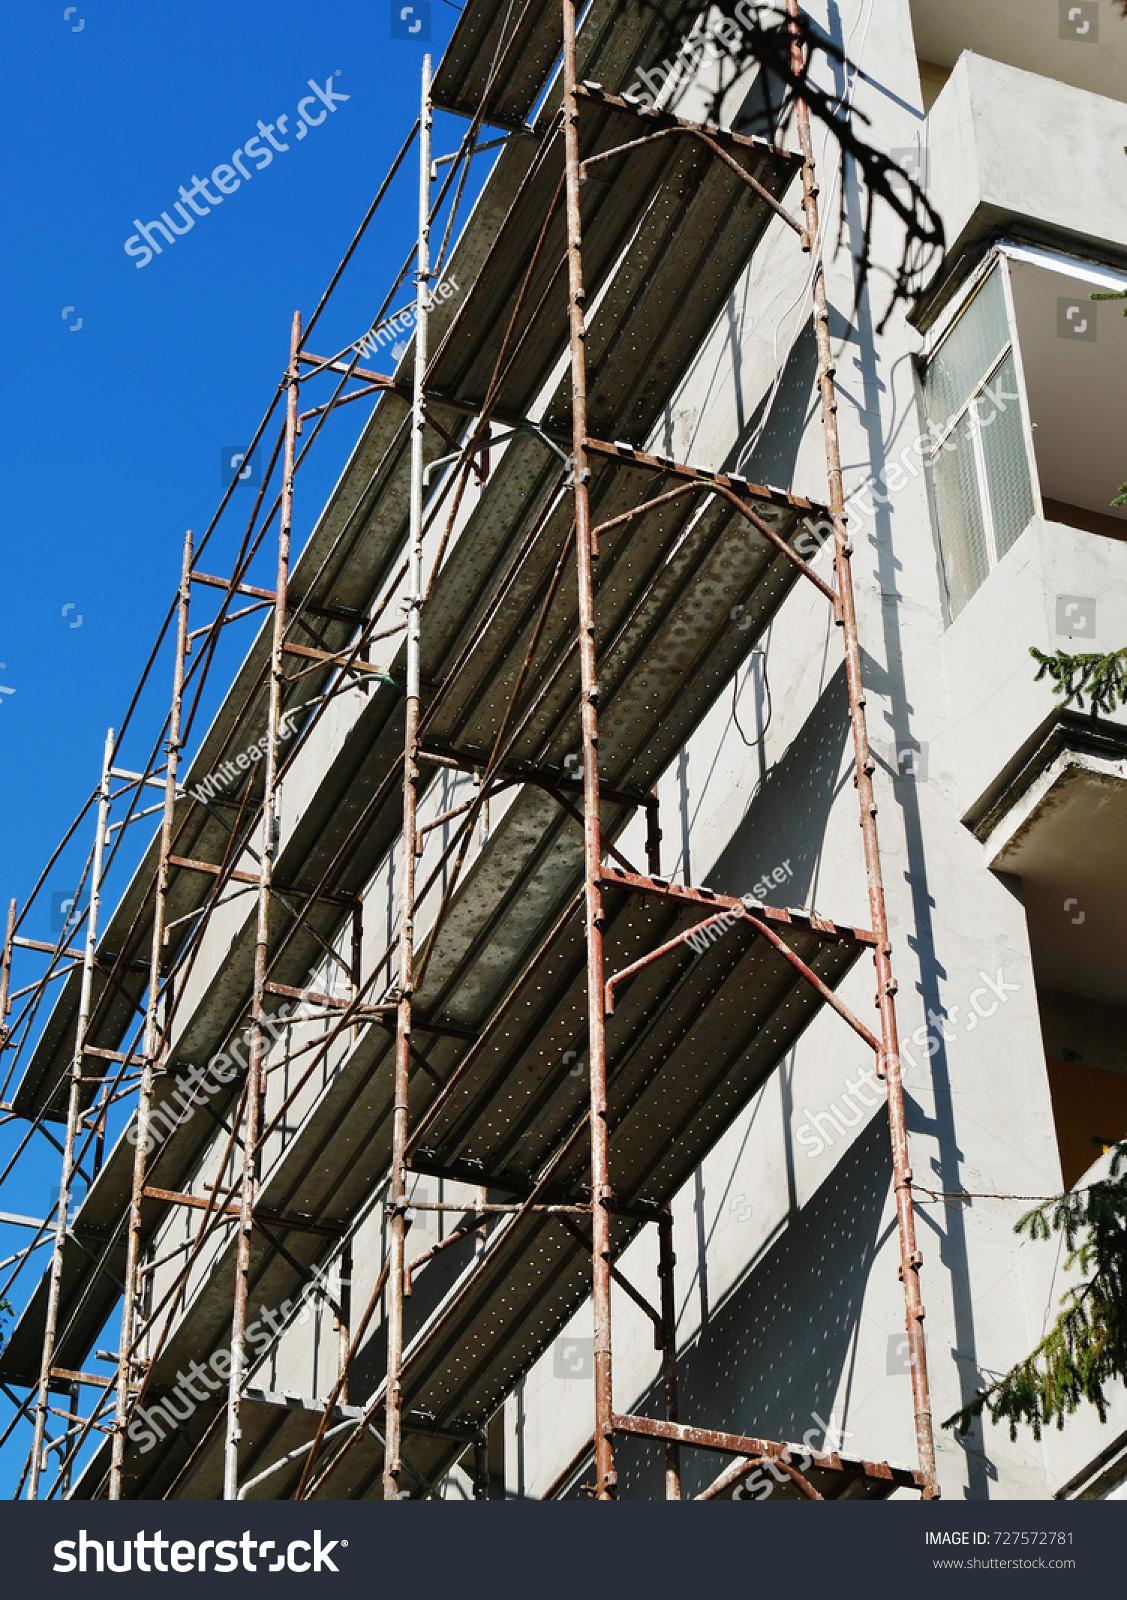 Block Of Flats Undergoing Exterior Renovation Work. Metallic Scaffolding Is  Raised Near Building Wall.